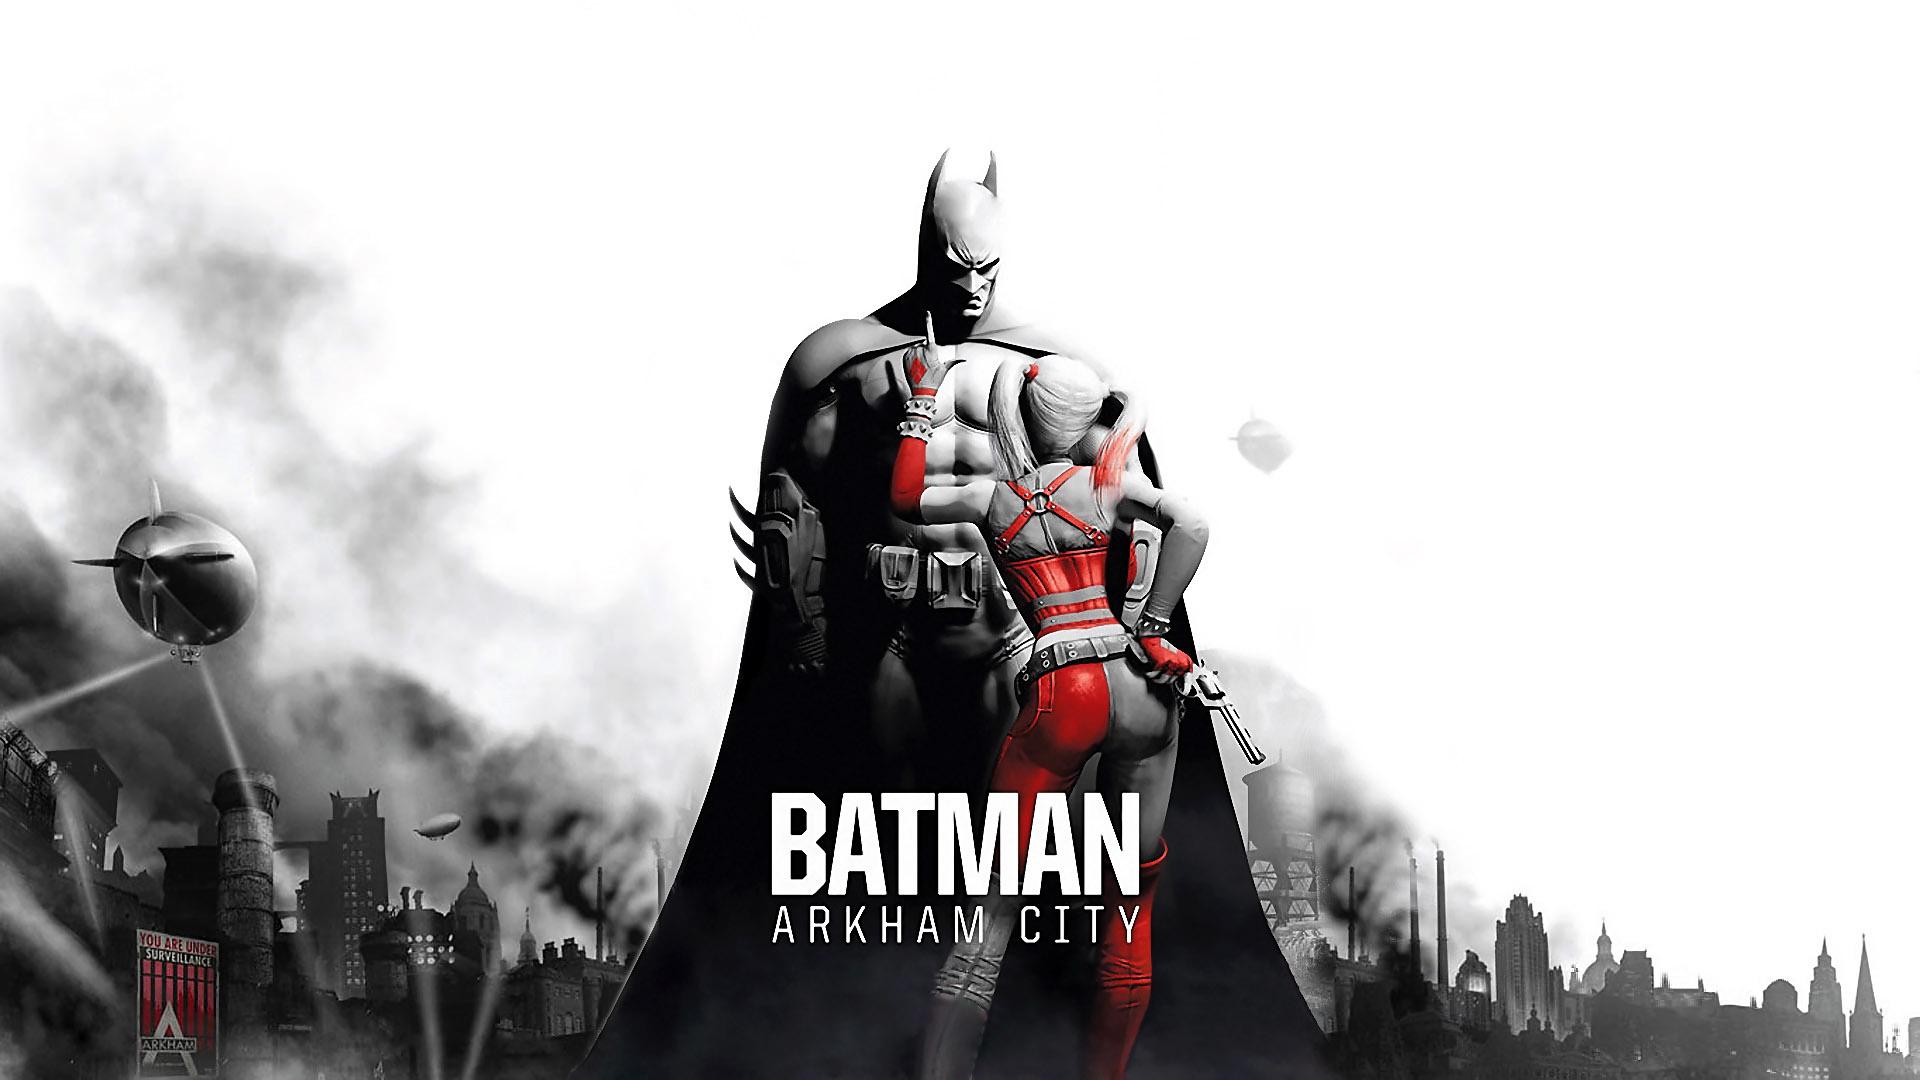 Batman Arkham City Batman Harleyjpg 1920x1080